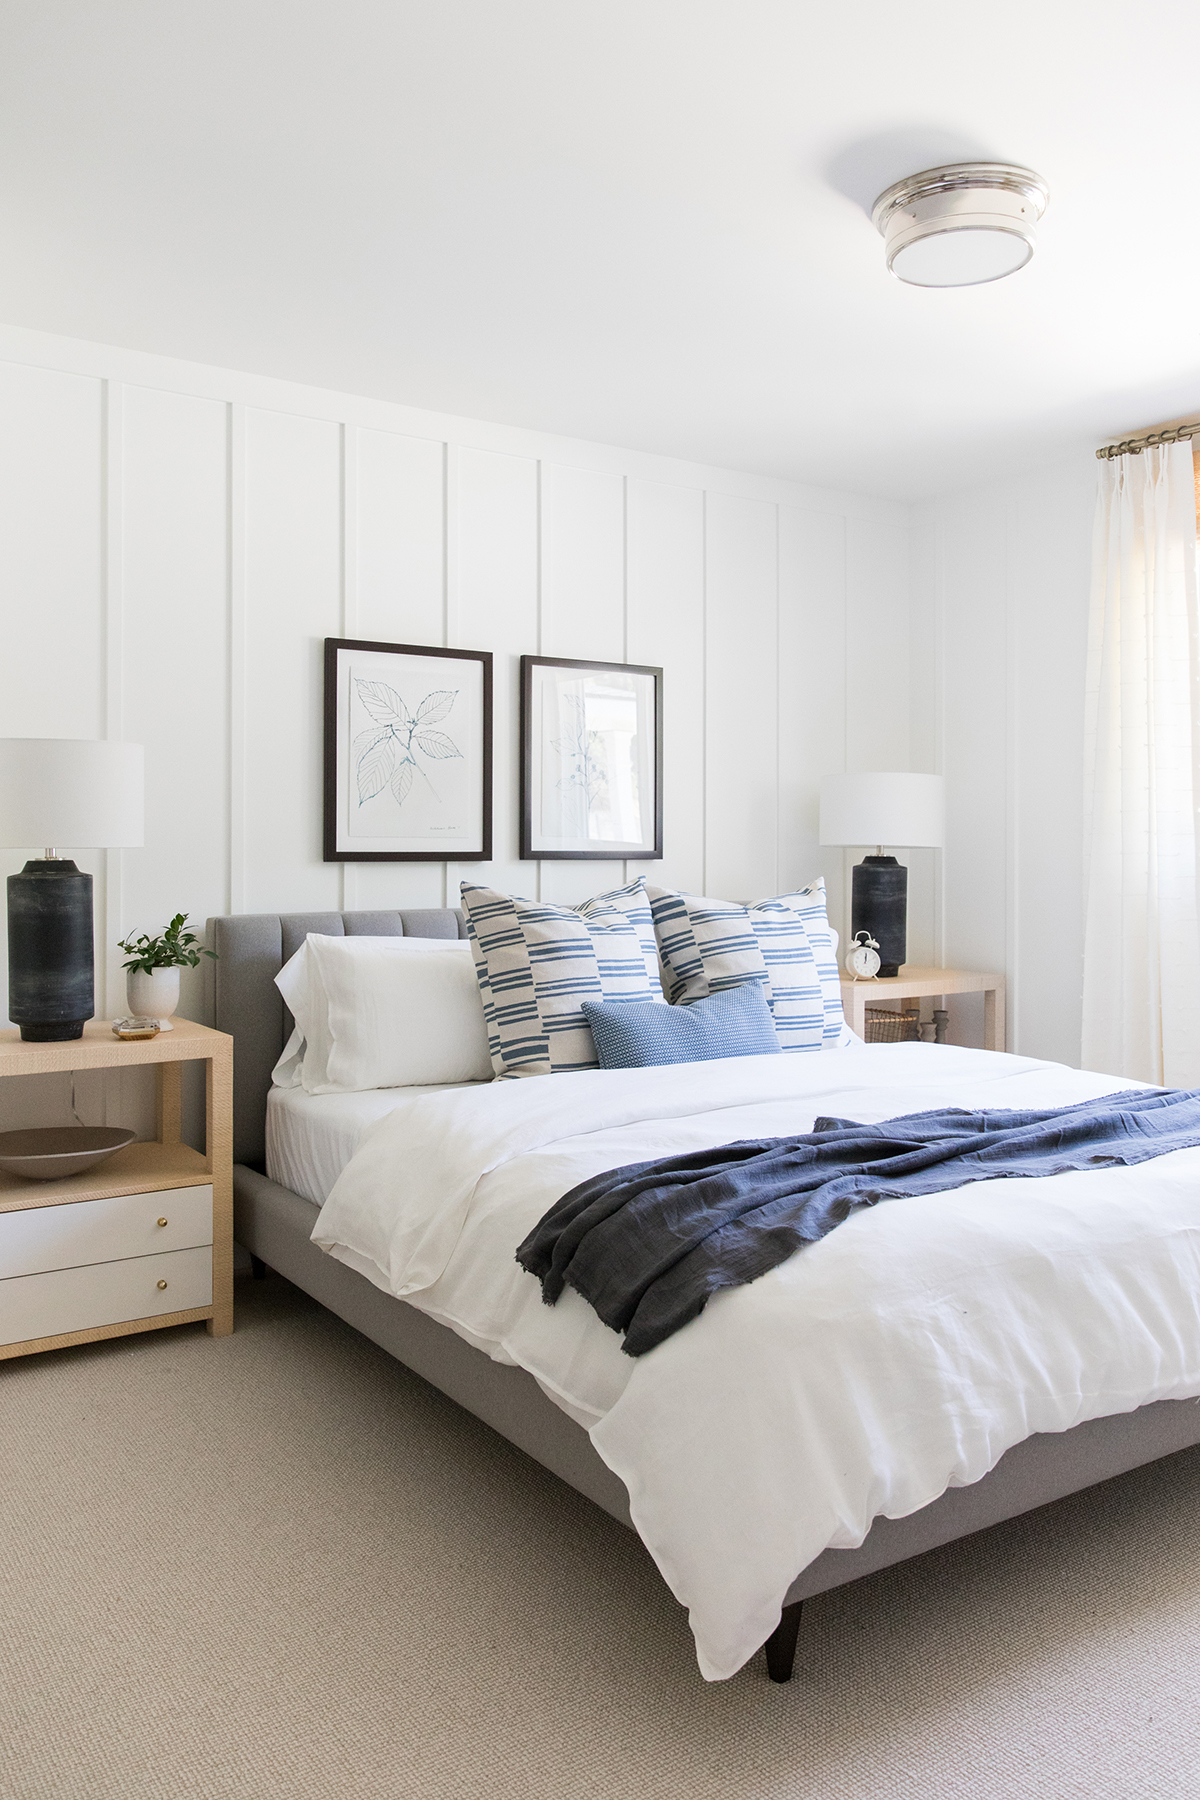 Natural,+textured+bedroom+with+fort+batten+wall+detail+_+Studio+McGee+Blog-1.jpg